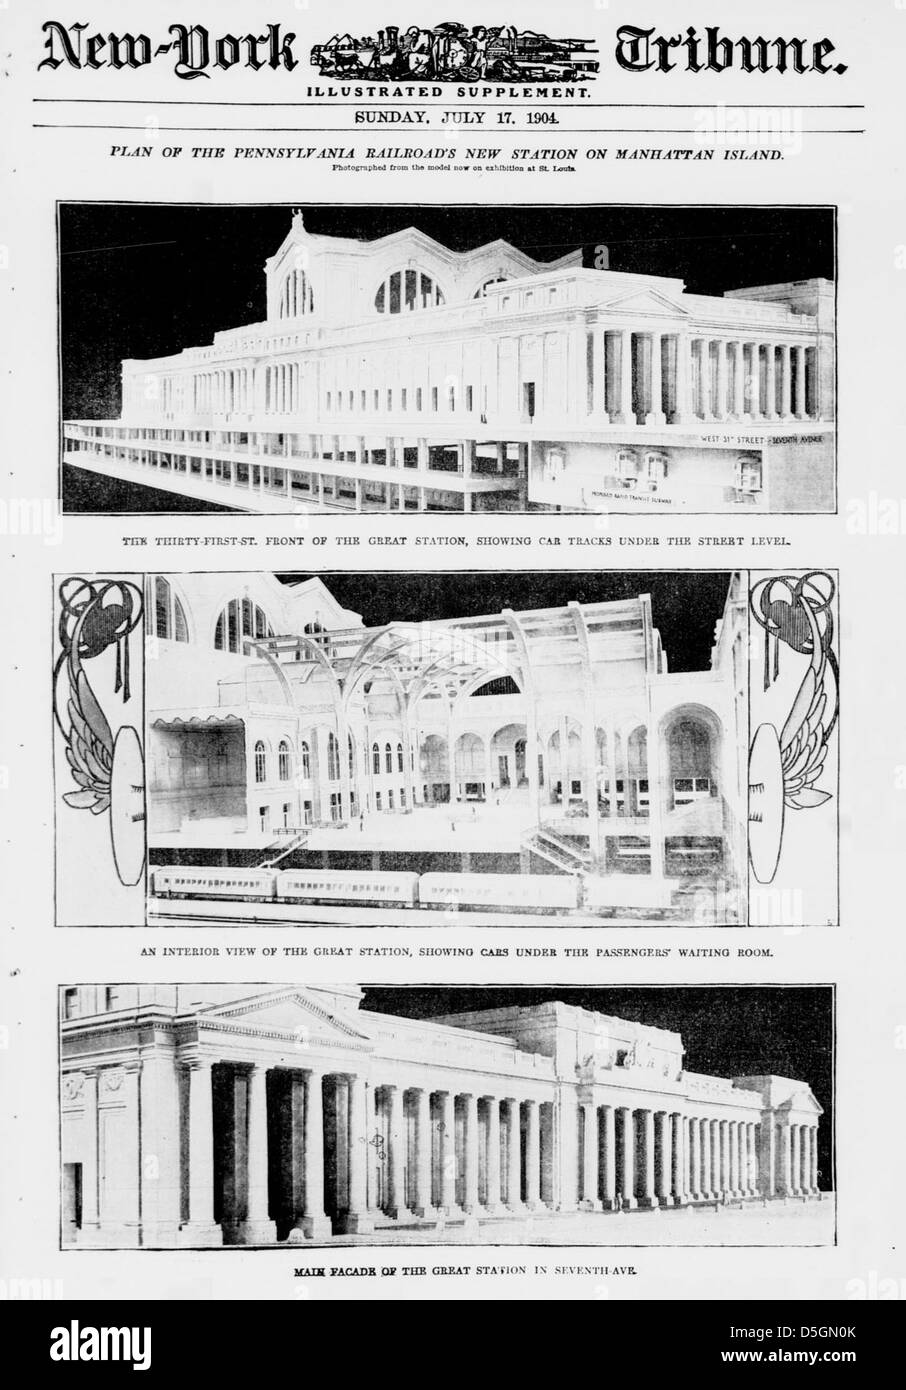 Plan of the Pennsylvania Railroad's new station on Manhattan Island (LOC) - Stock Image